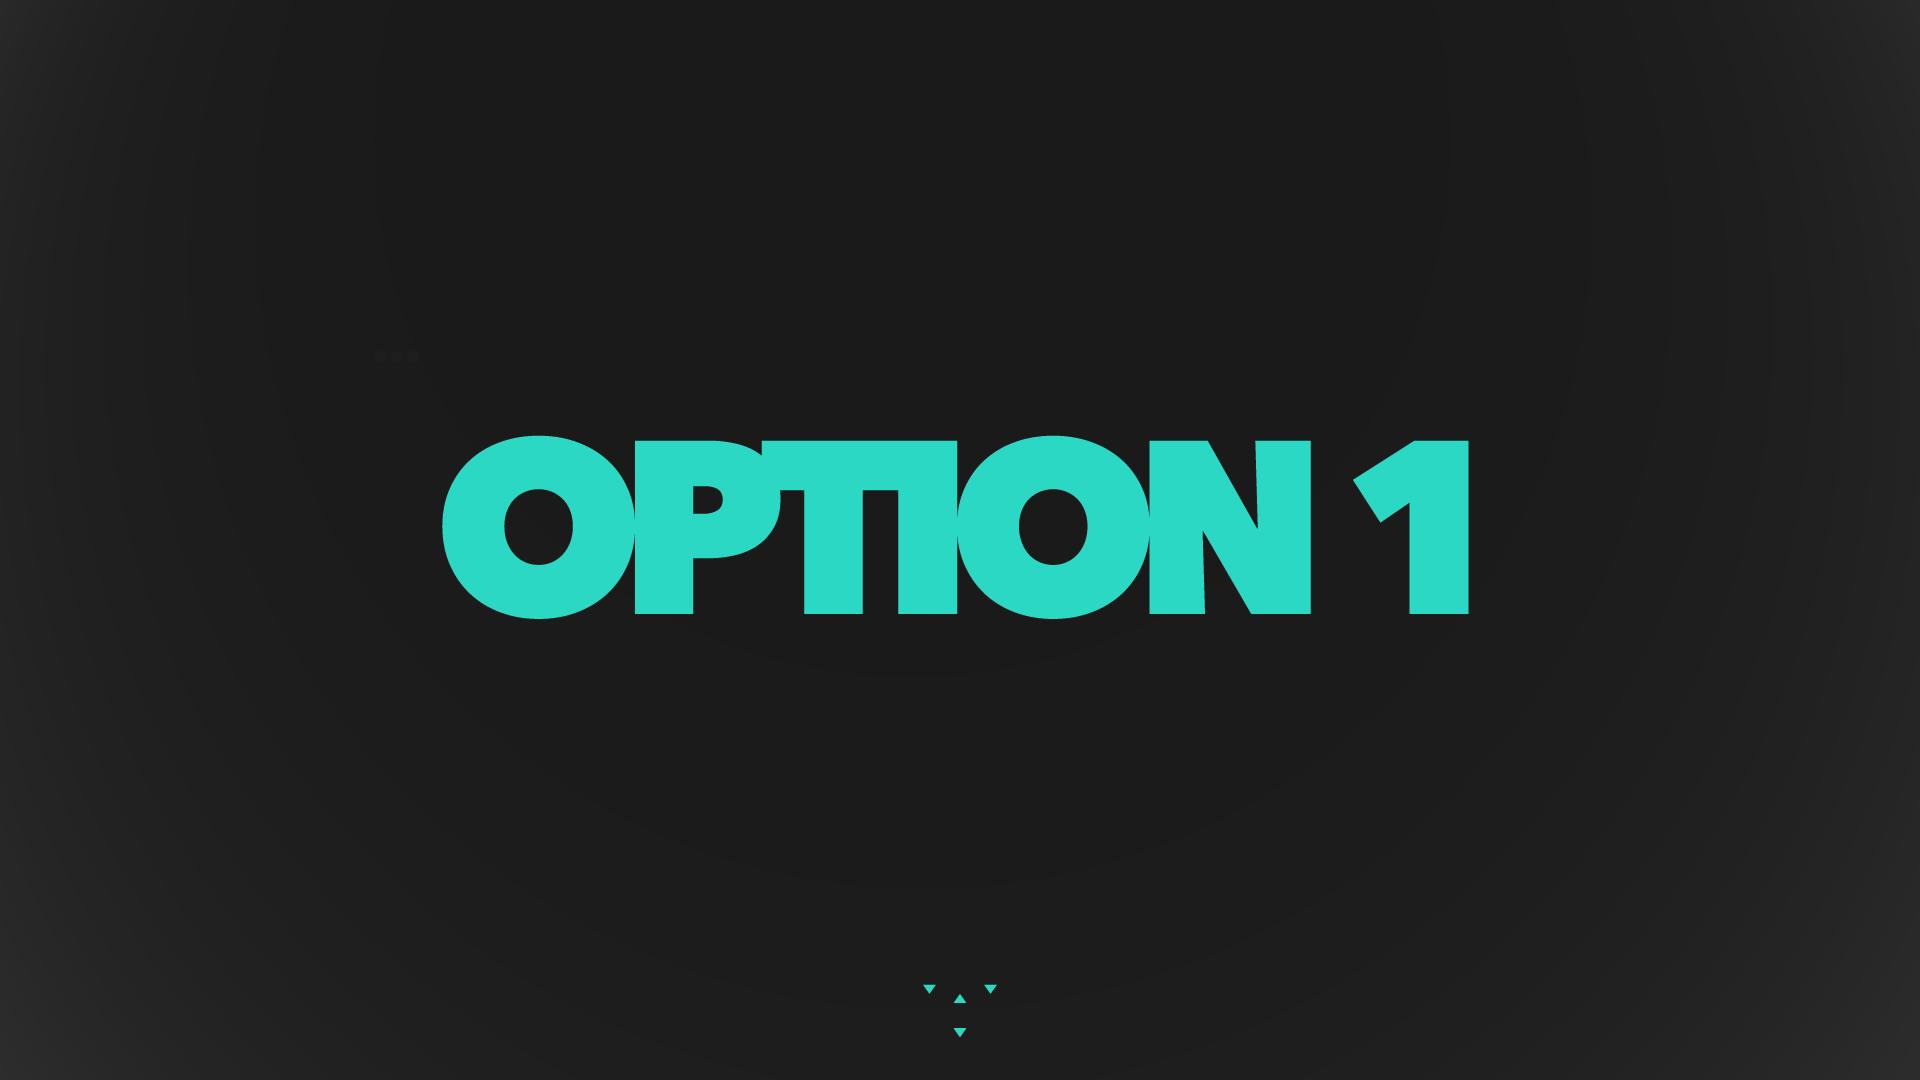 02_option1.png